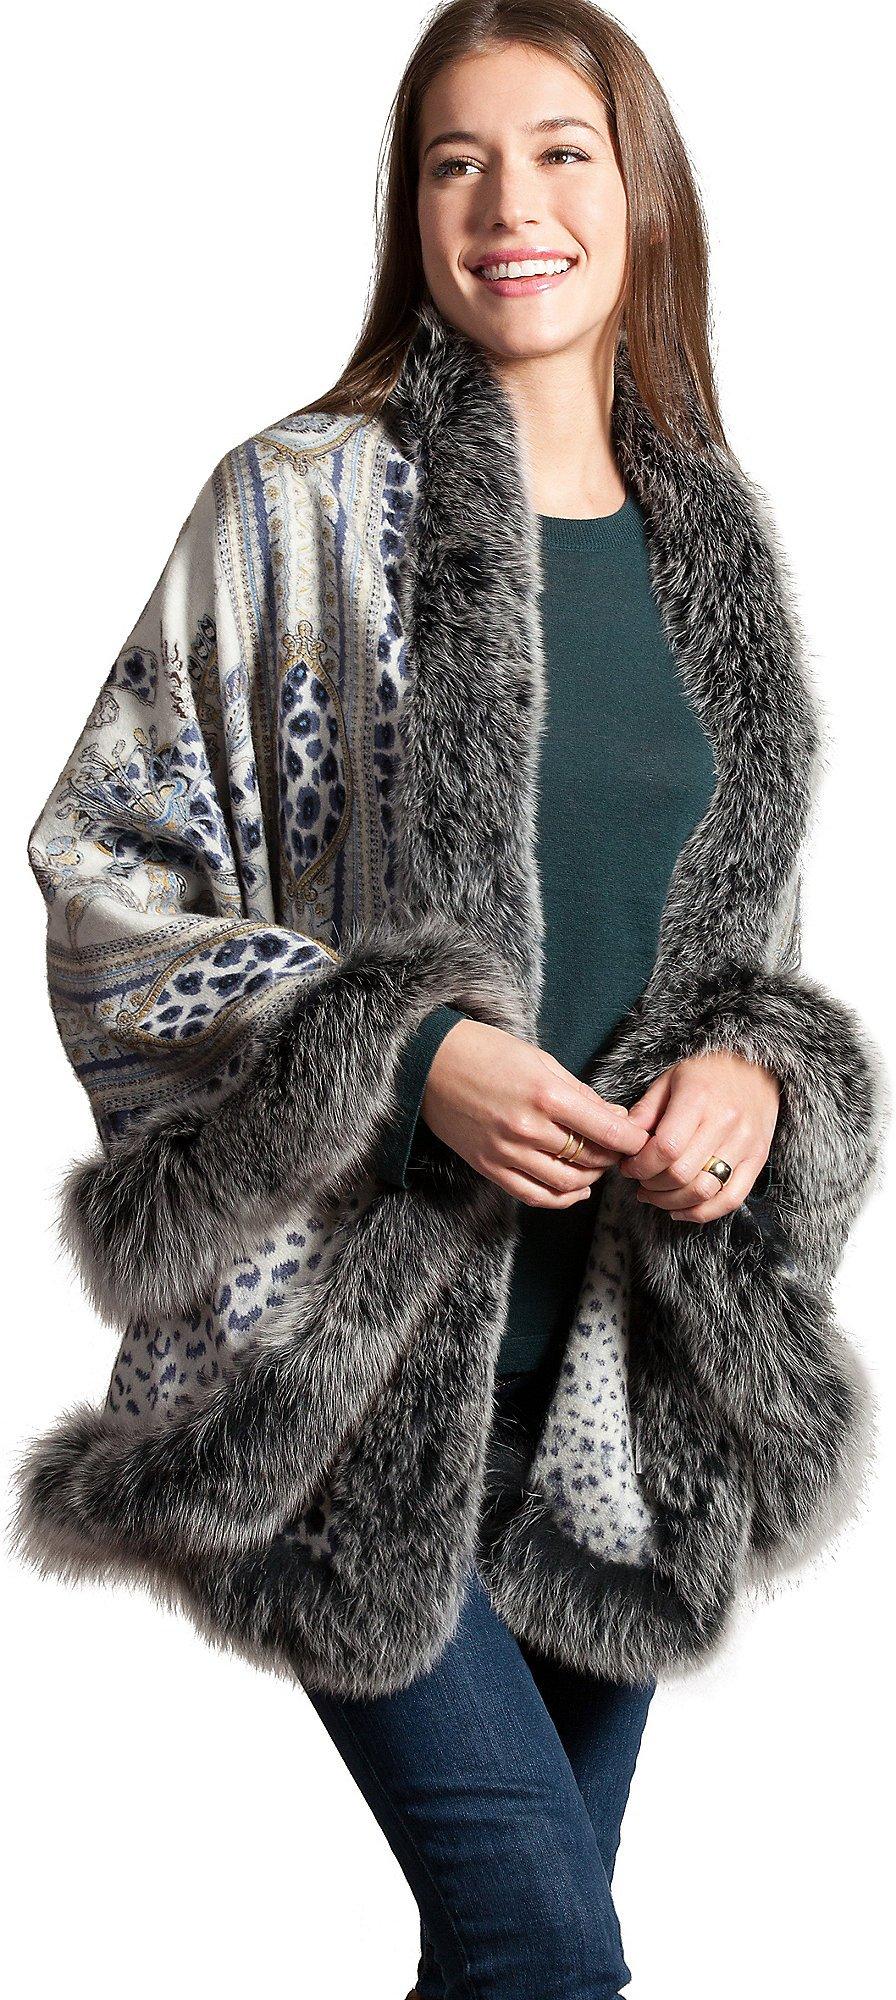 Amy Cashmere-Blend Shawl with Blue Fox Fur Trim by Overland Sheepskin Co